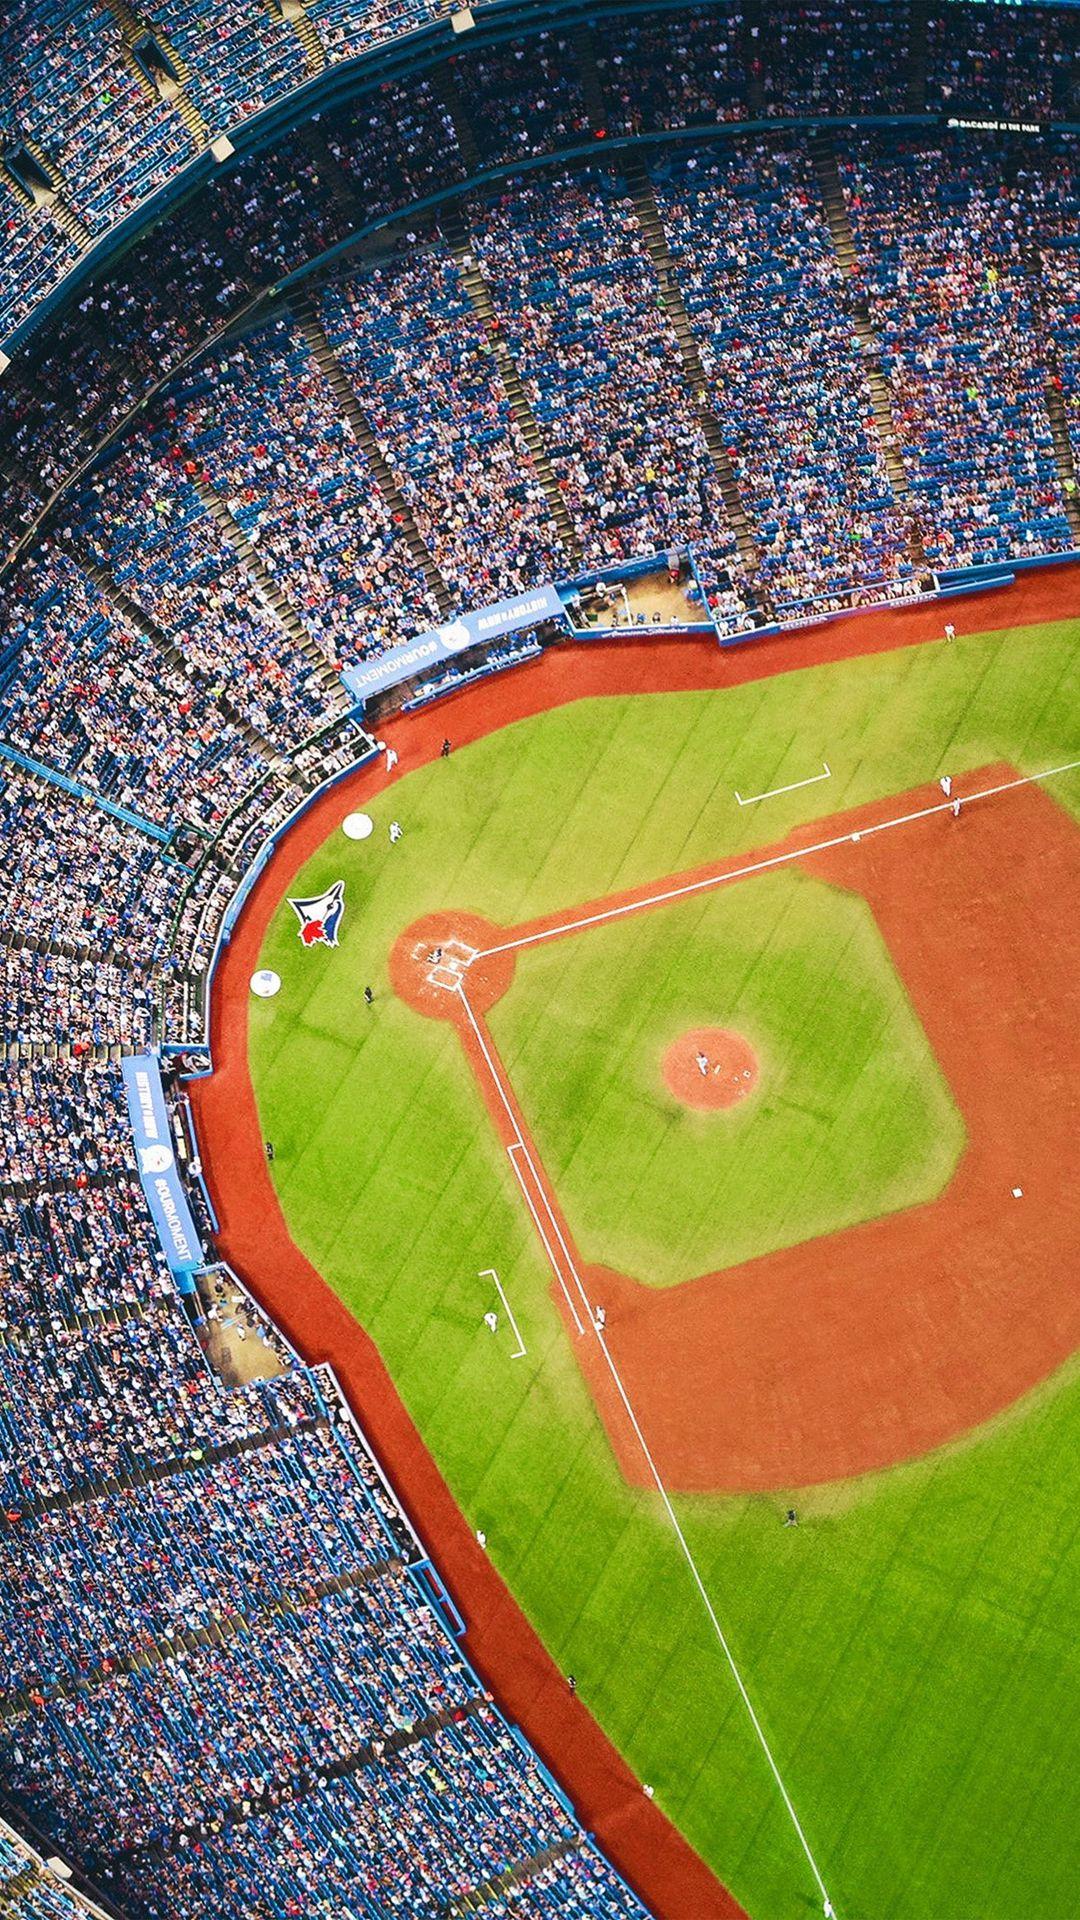 Baseball Background Picture In 2020 Baseball Wallpaper Mlb Baseball Baseball Backgrounds